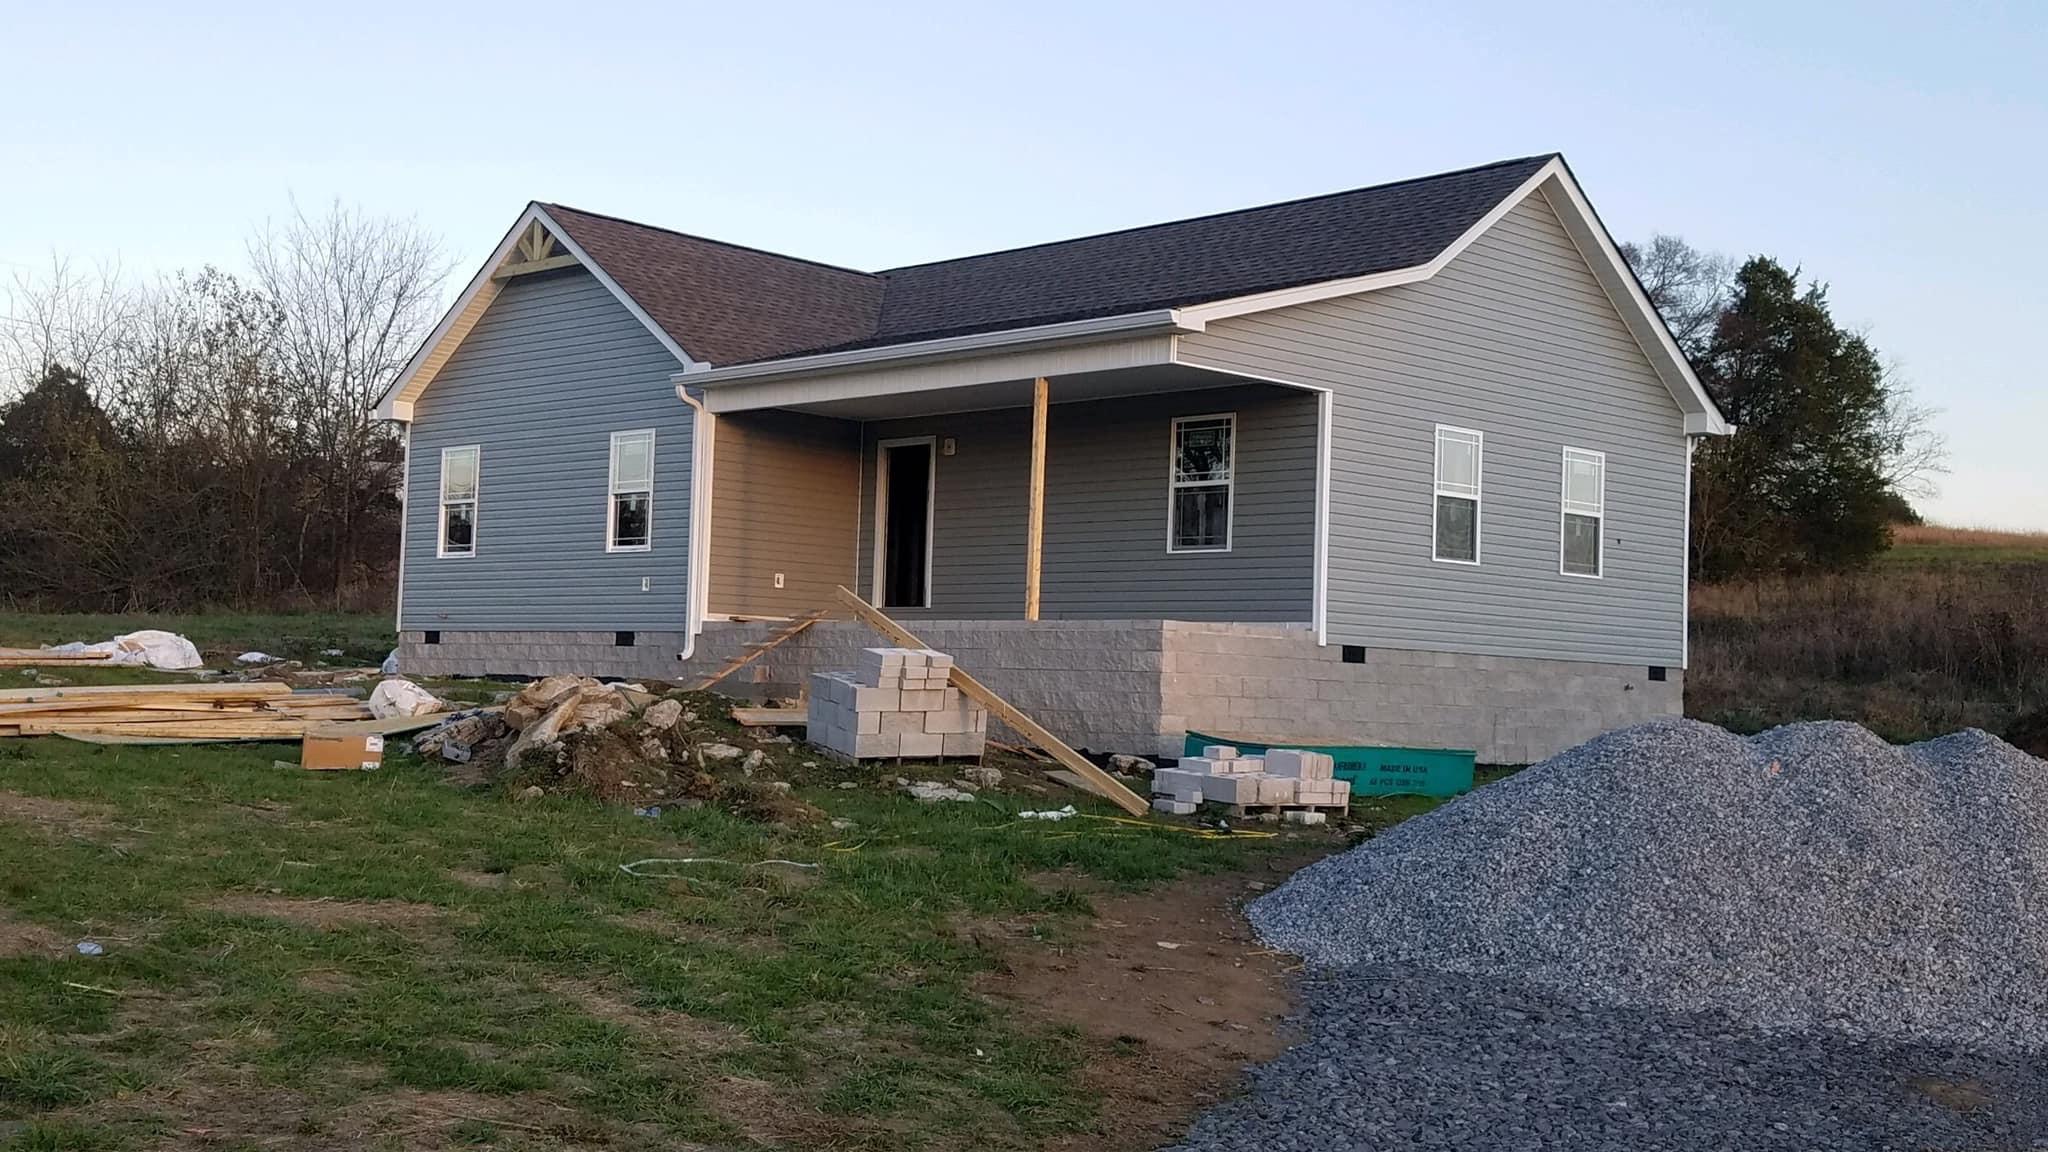 392 New Hope Rd, Alexandria, TN 37012 - Alexandria, TN real estate listing